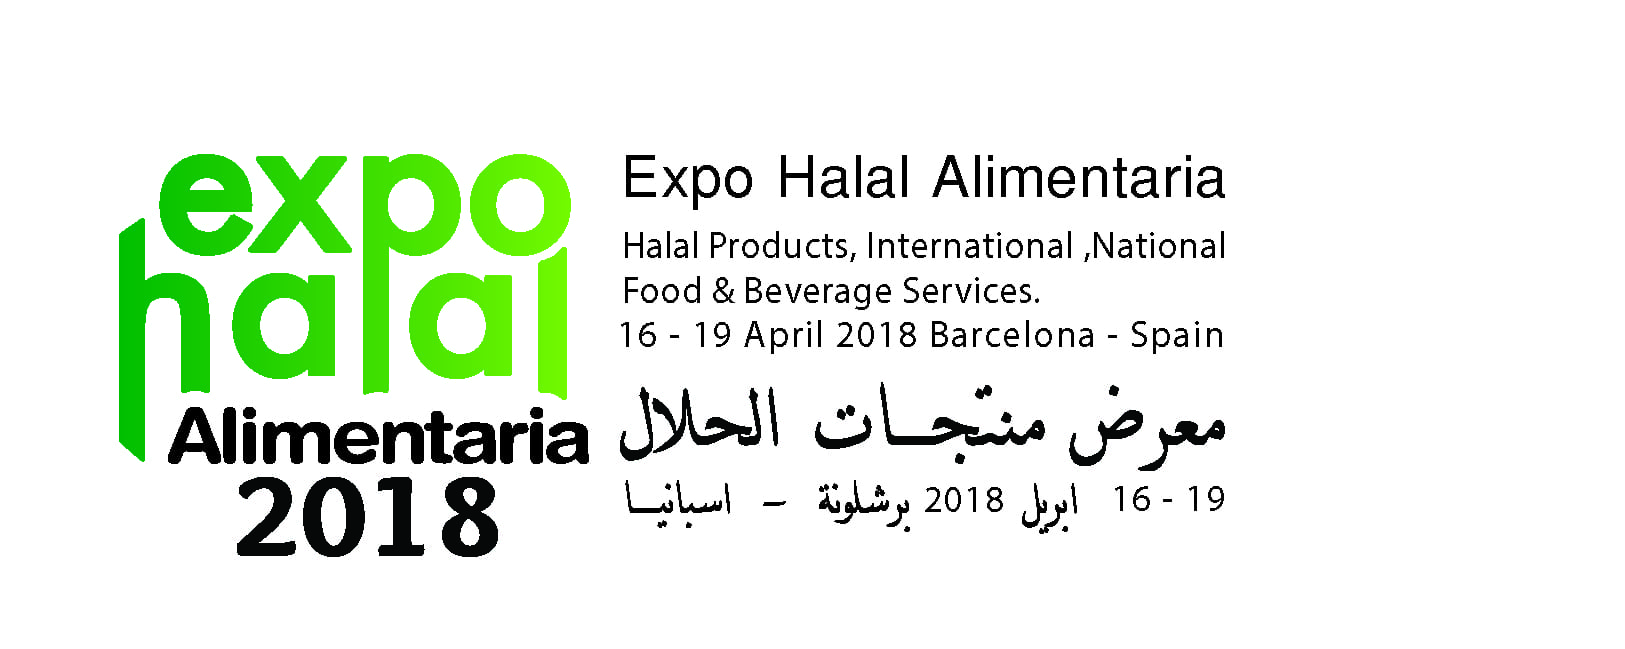 New LOGO Expo Halal Alimentaria Feb 20th